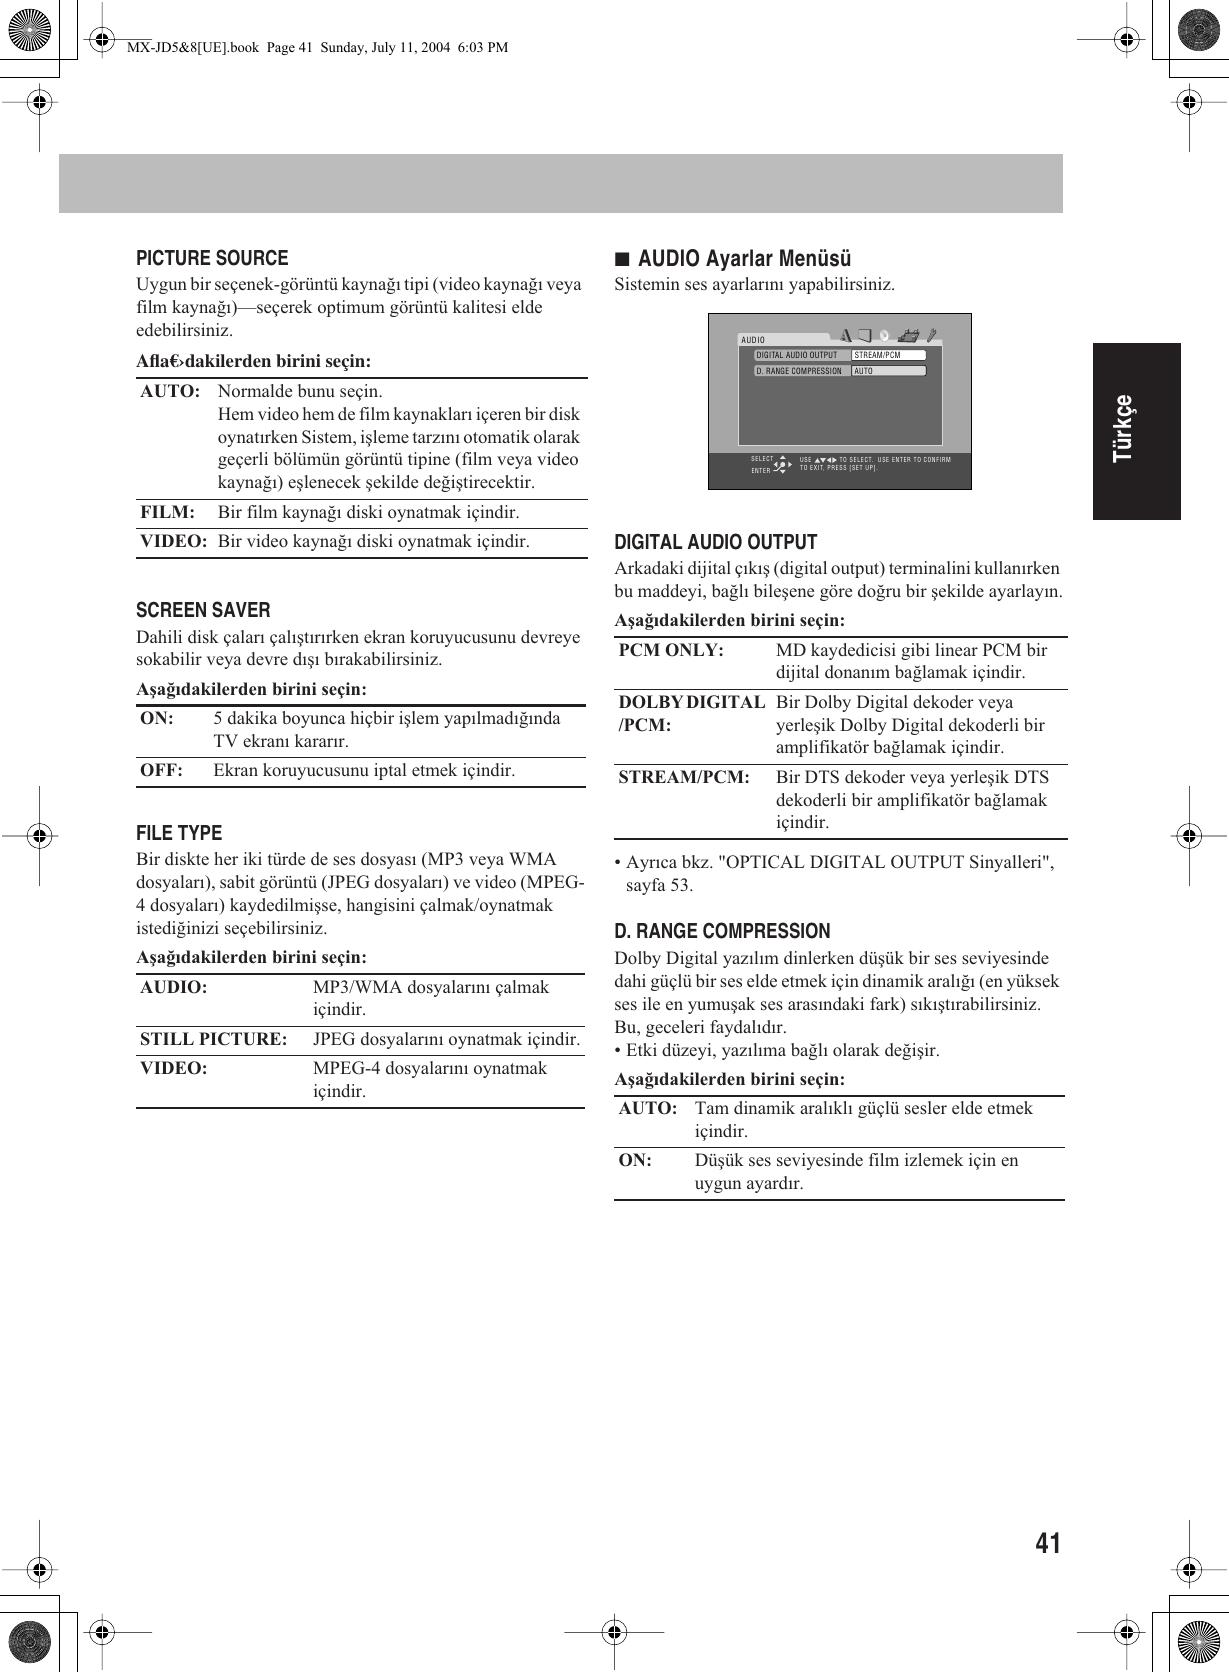 JVC CA MXJD5UE Cover[UE] User Manual GVT0127 003A